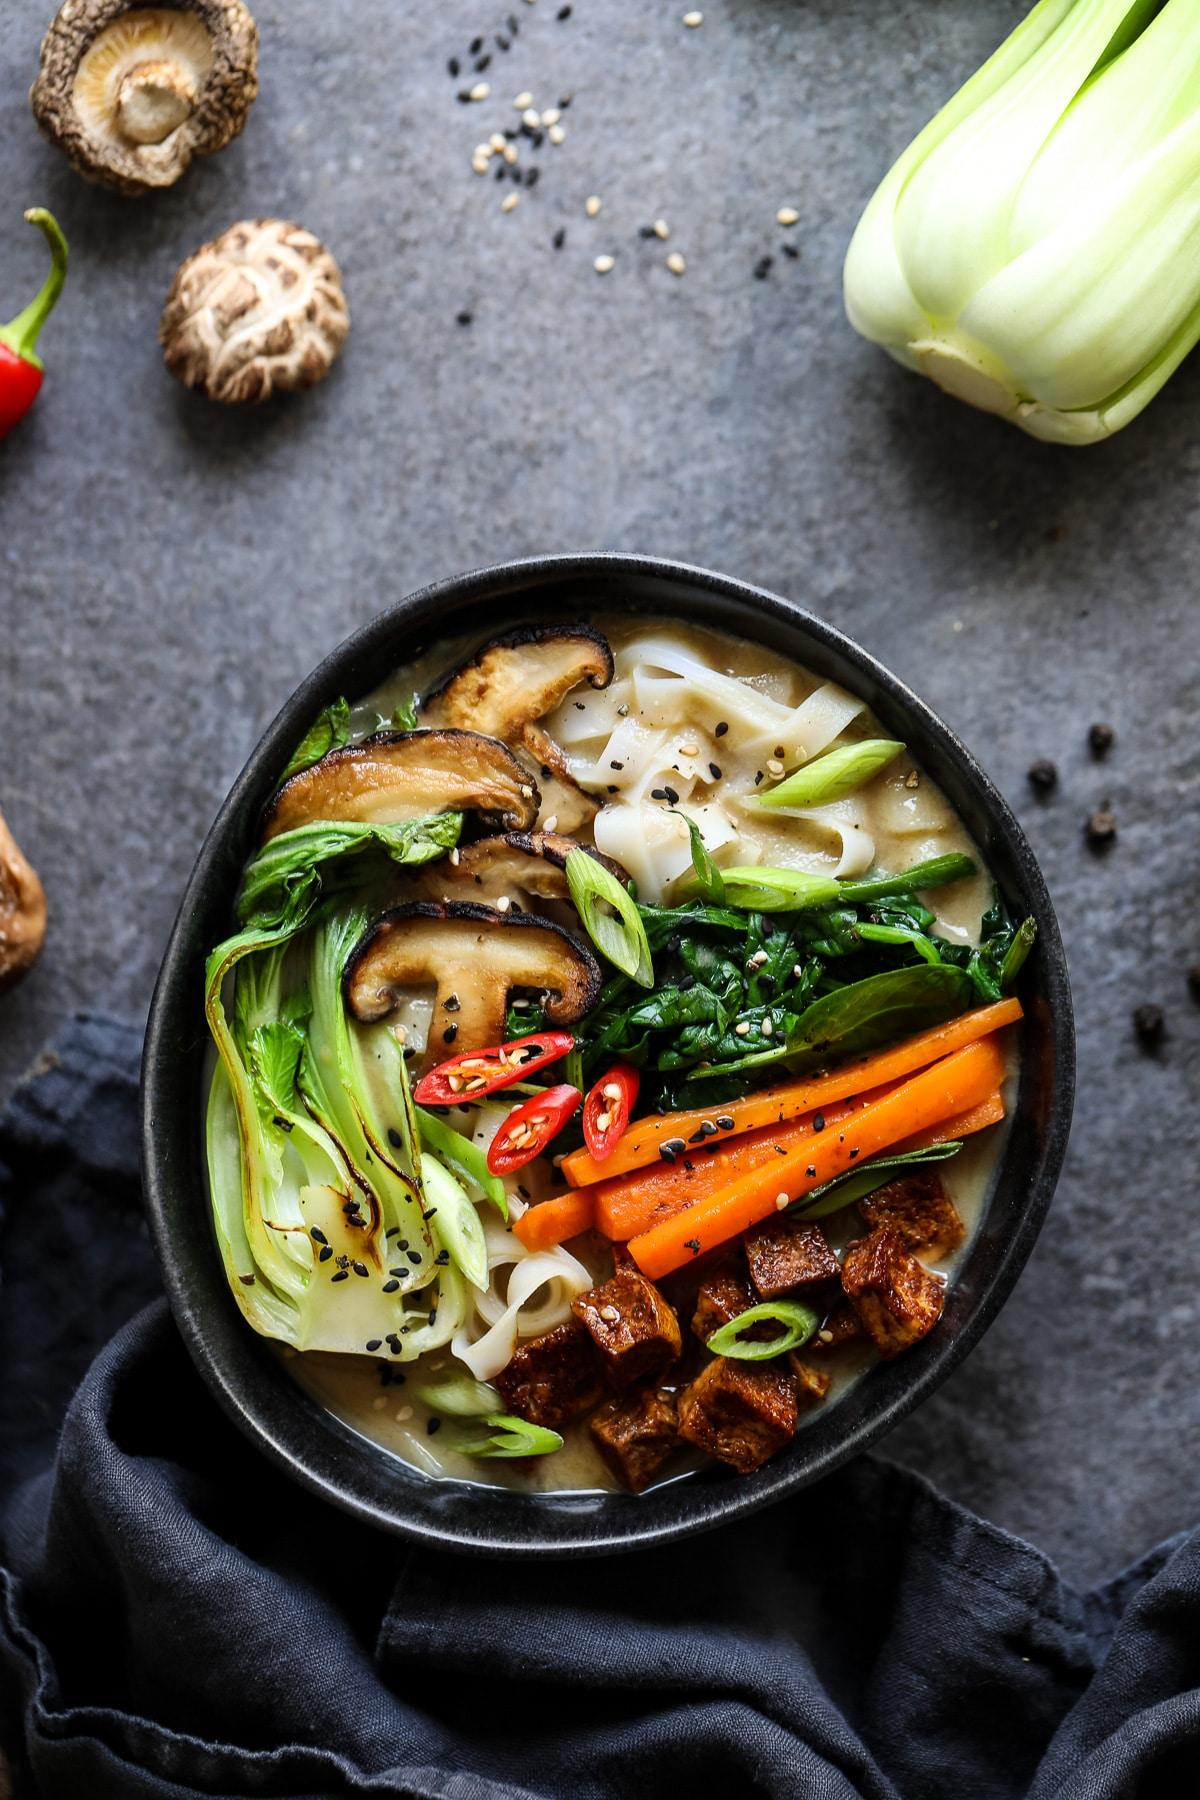 Vegetarian Ramen in a Black Bowl with Ingredient Props.